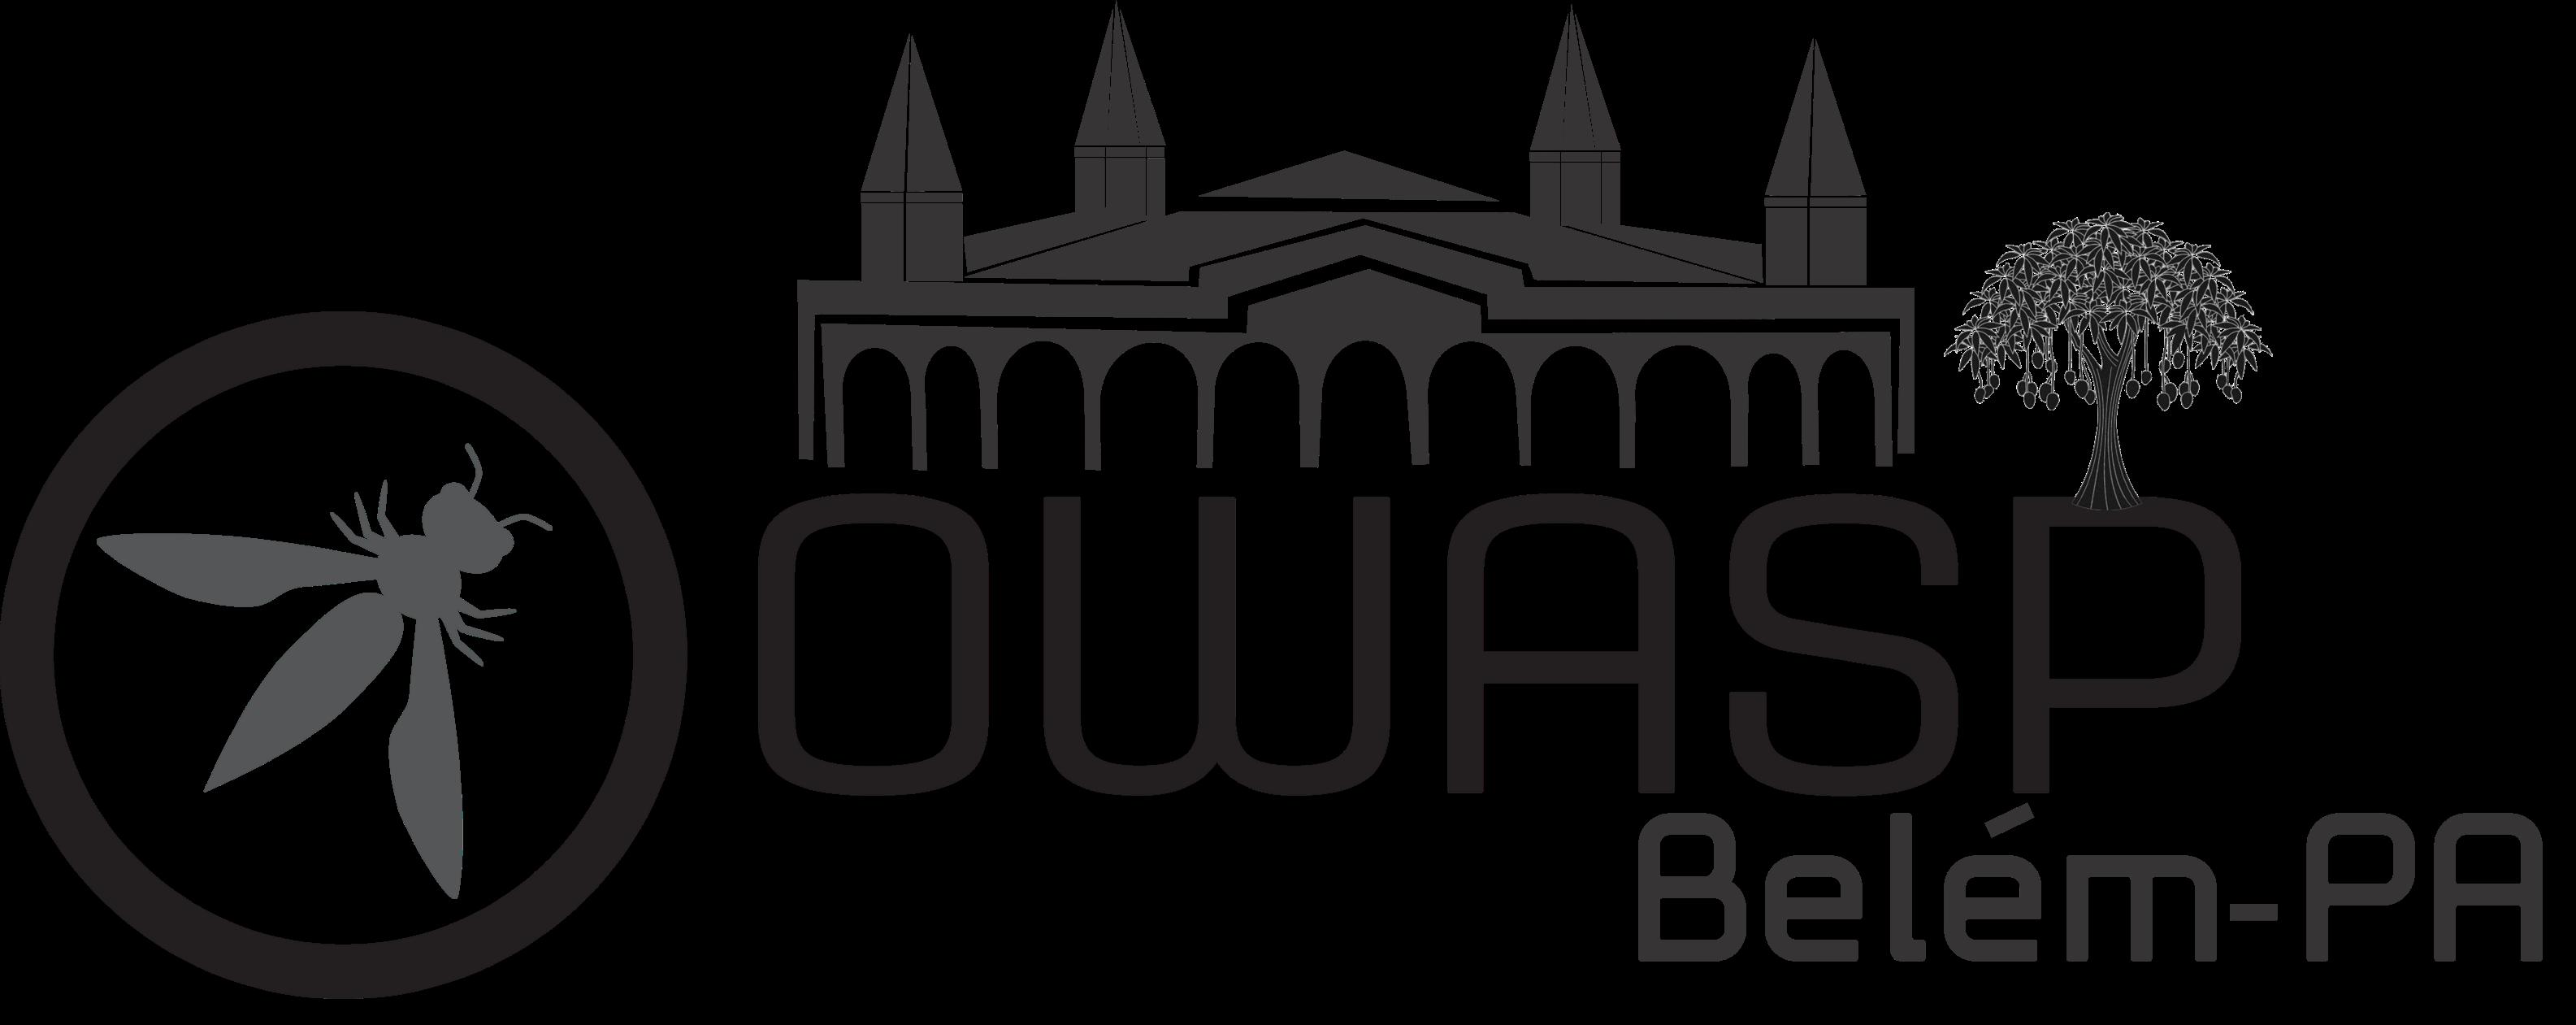 Owasp-Belem (2)